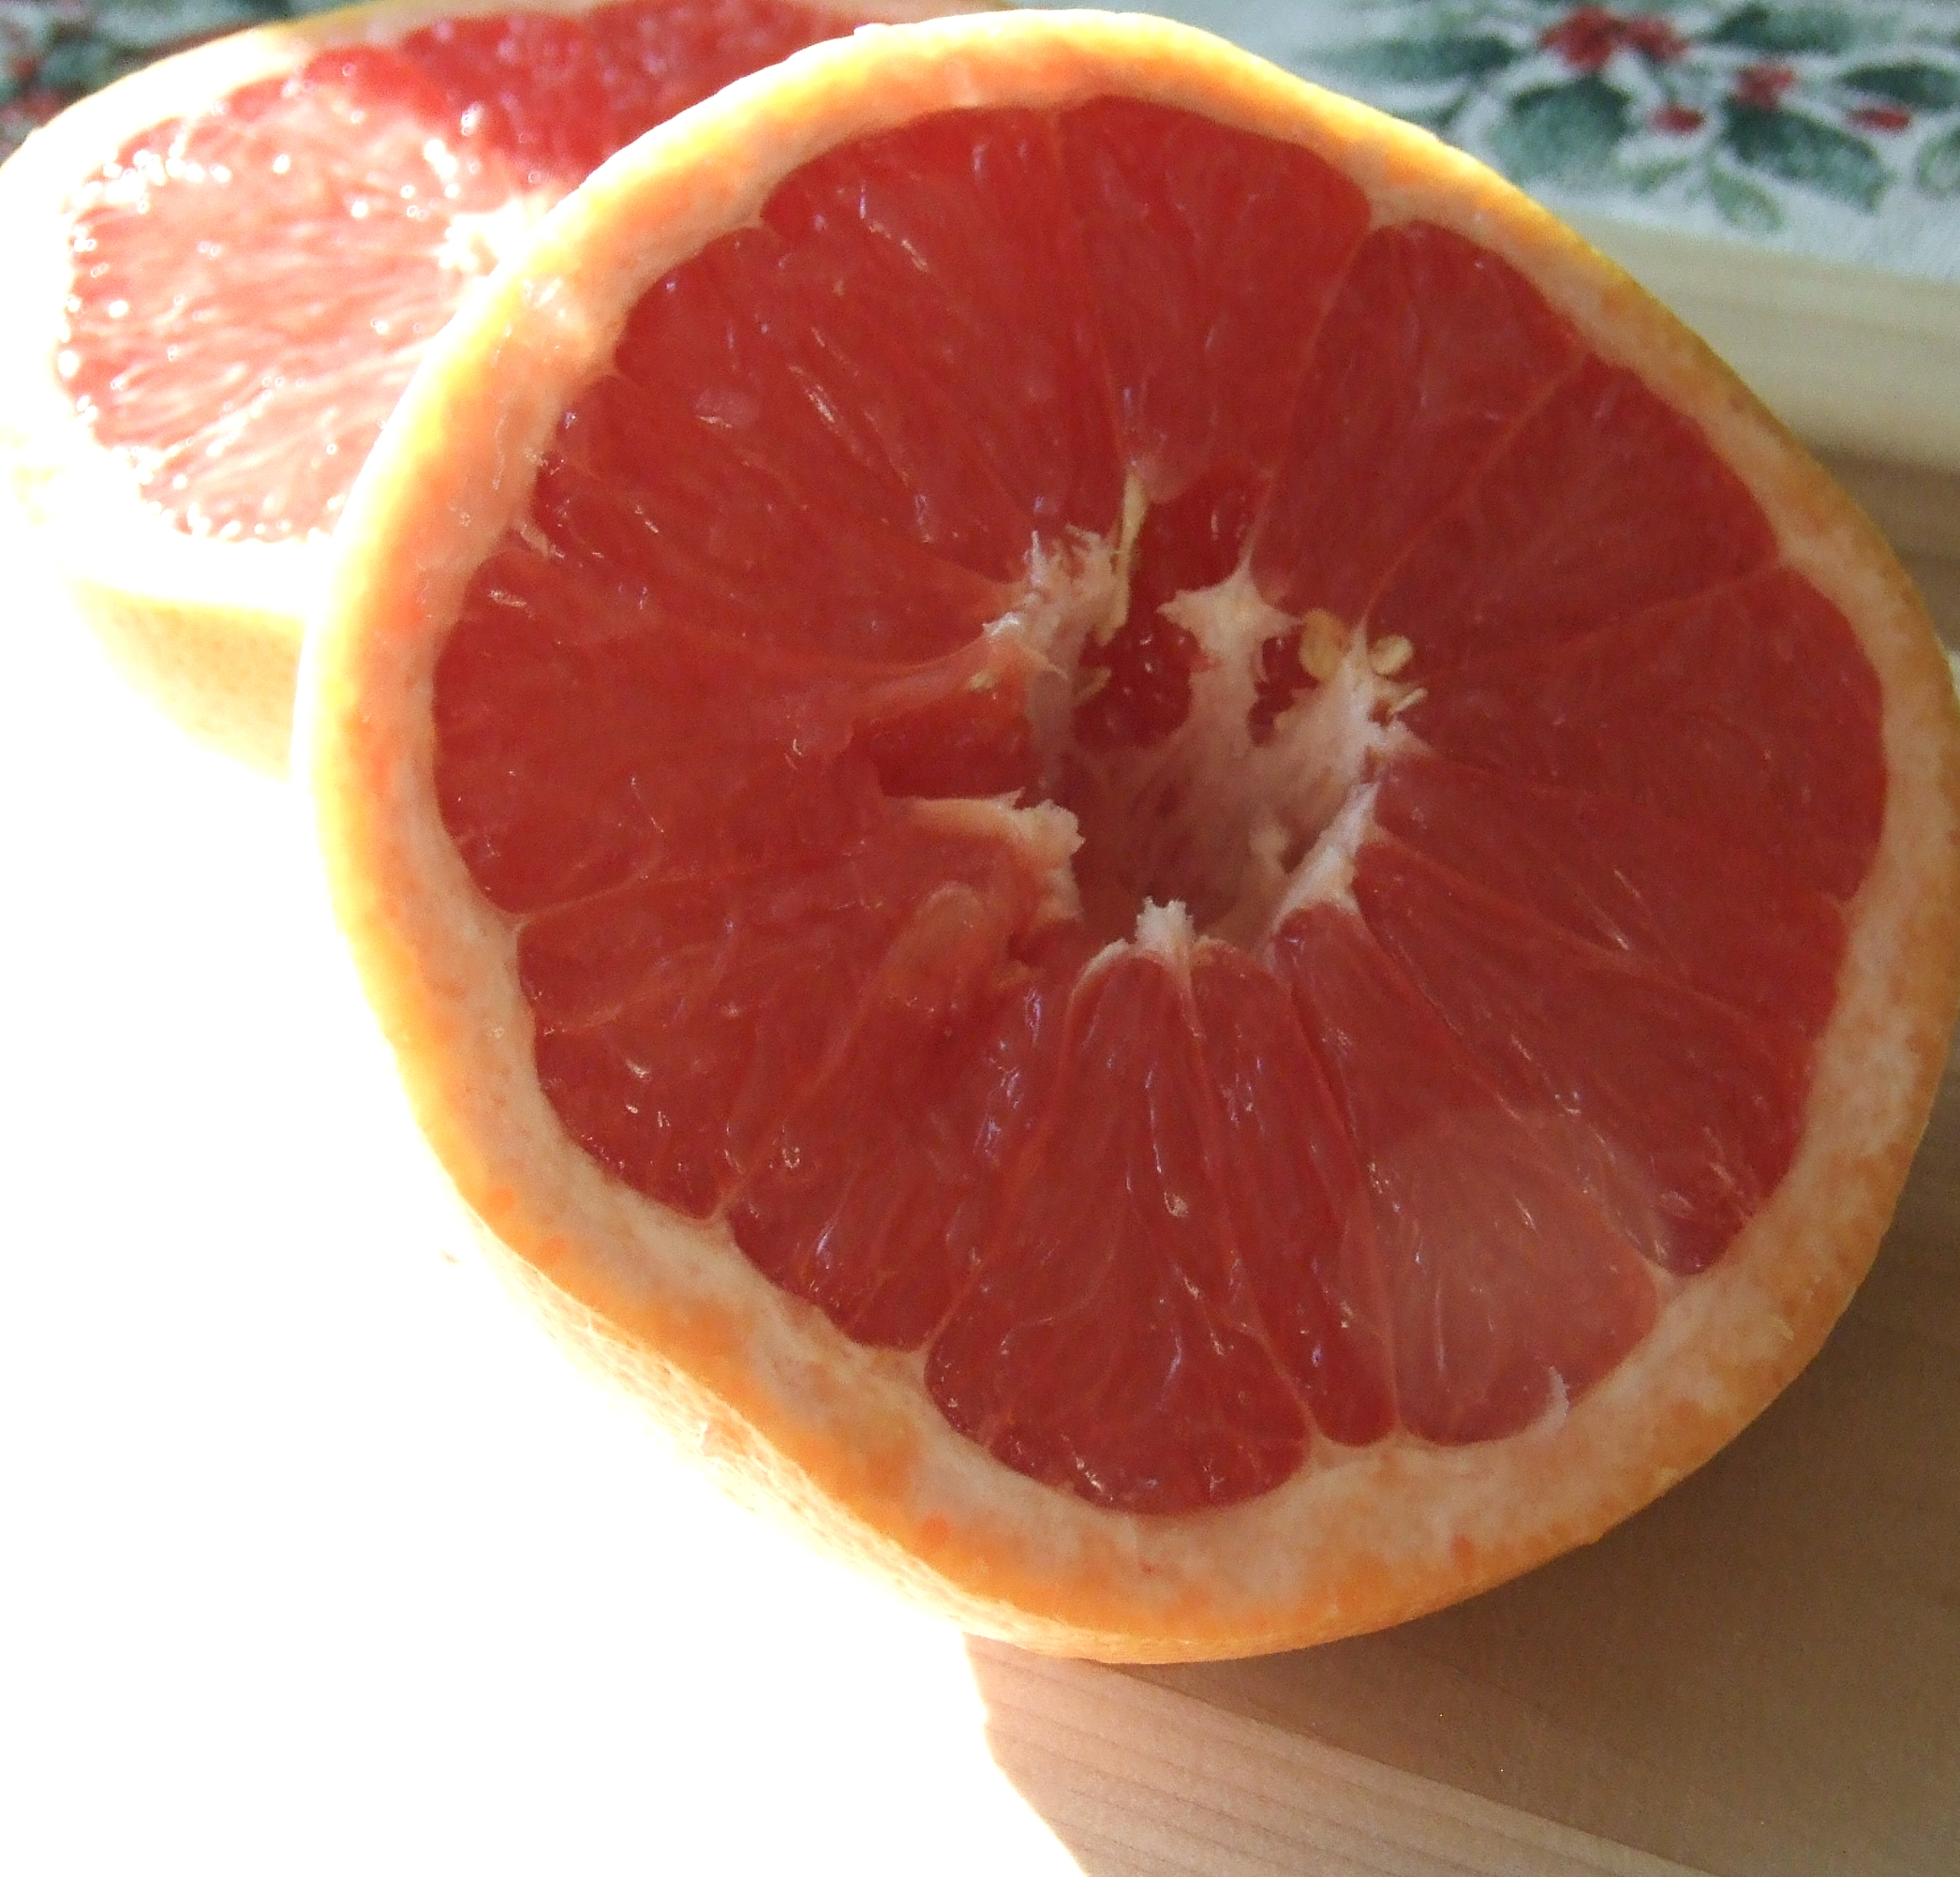 grapefruit_12.jpg